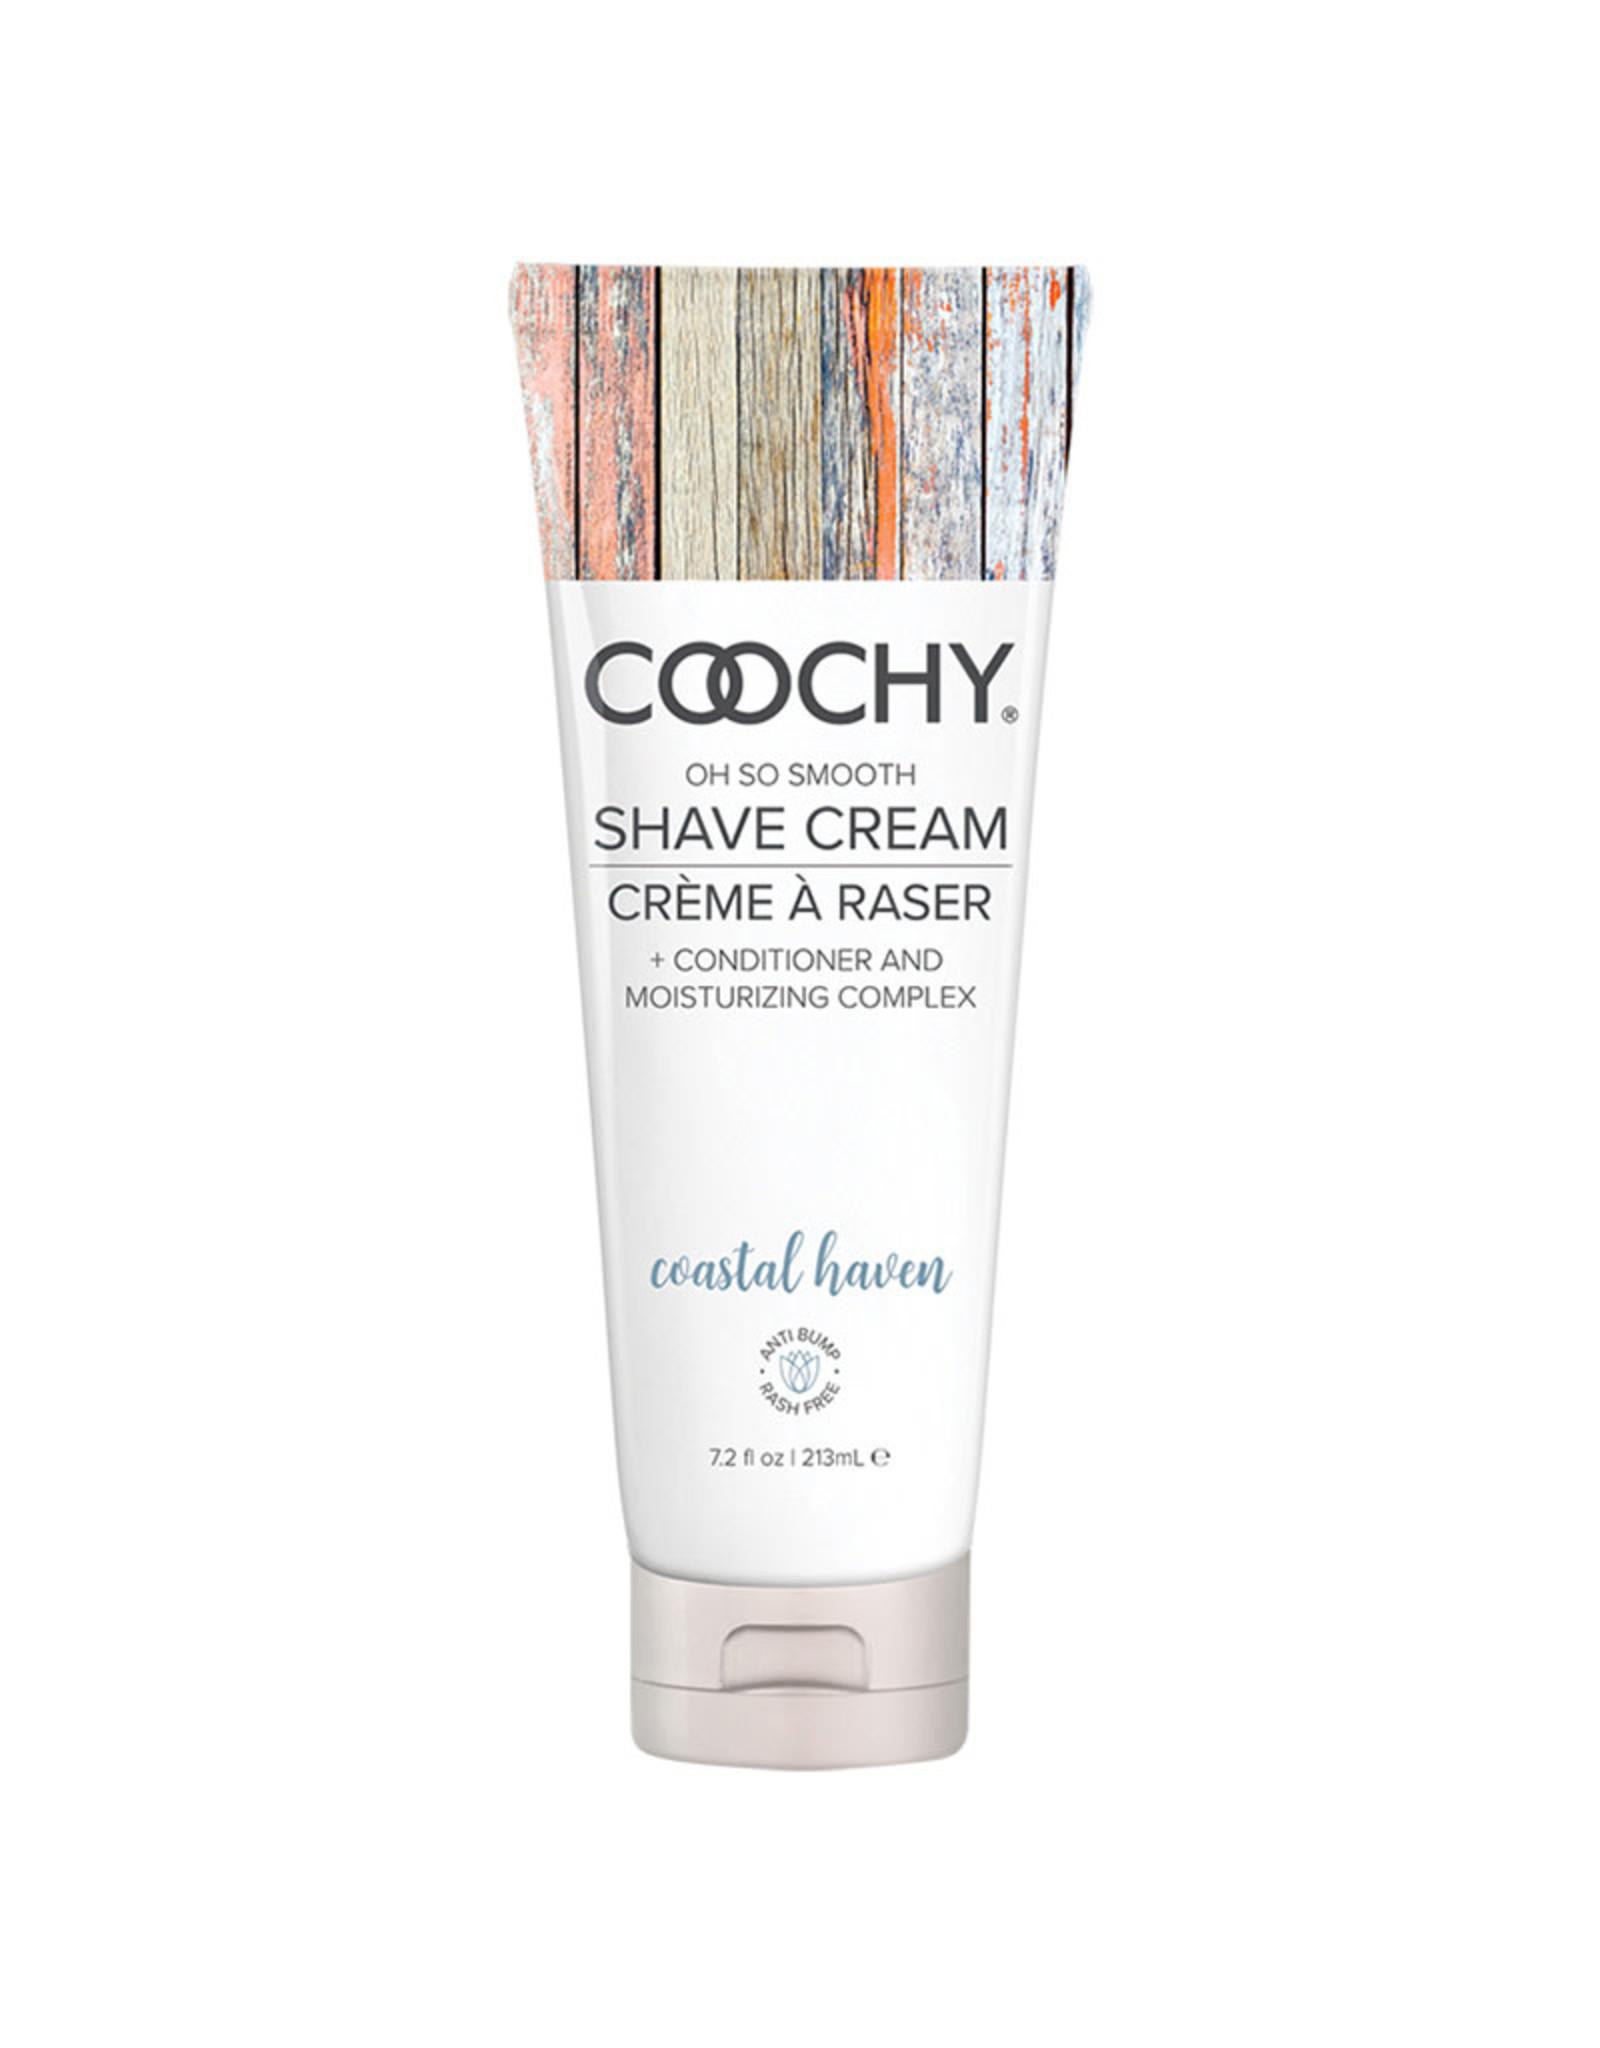 Classic Brands Coochy - Coastal Haven (7.2 oz)